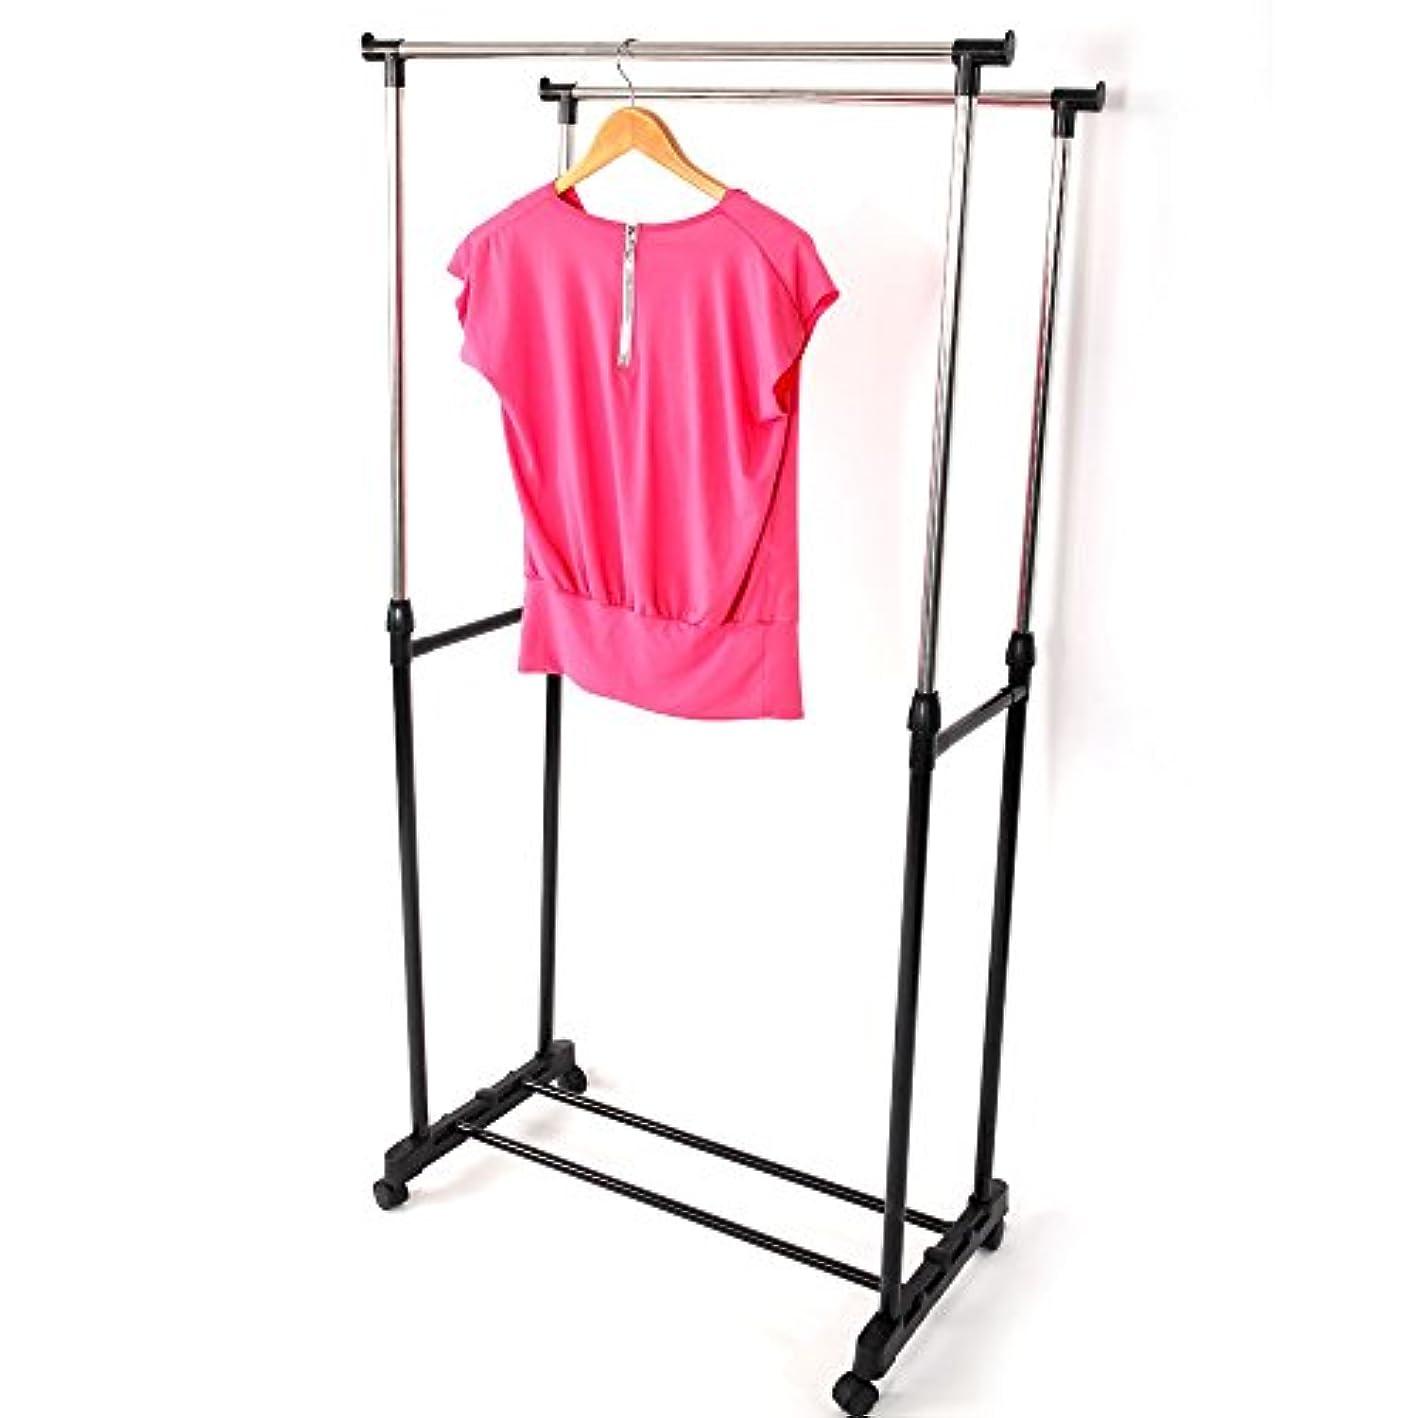 Ferty Double Rail Garment Racks, Heavy Duty Adjustable Height Clothing Shoe Racks with Wheels for Home